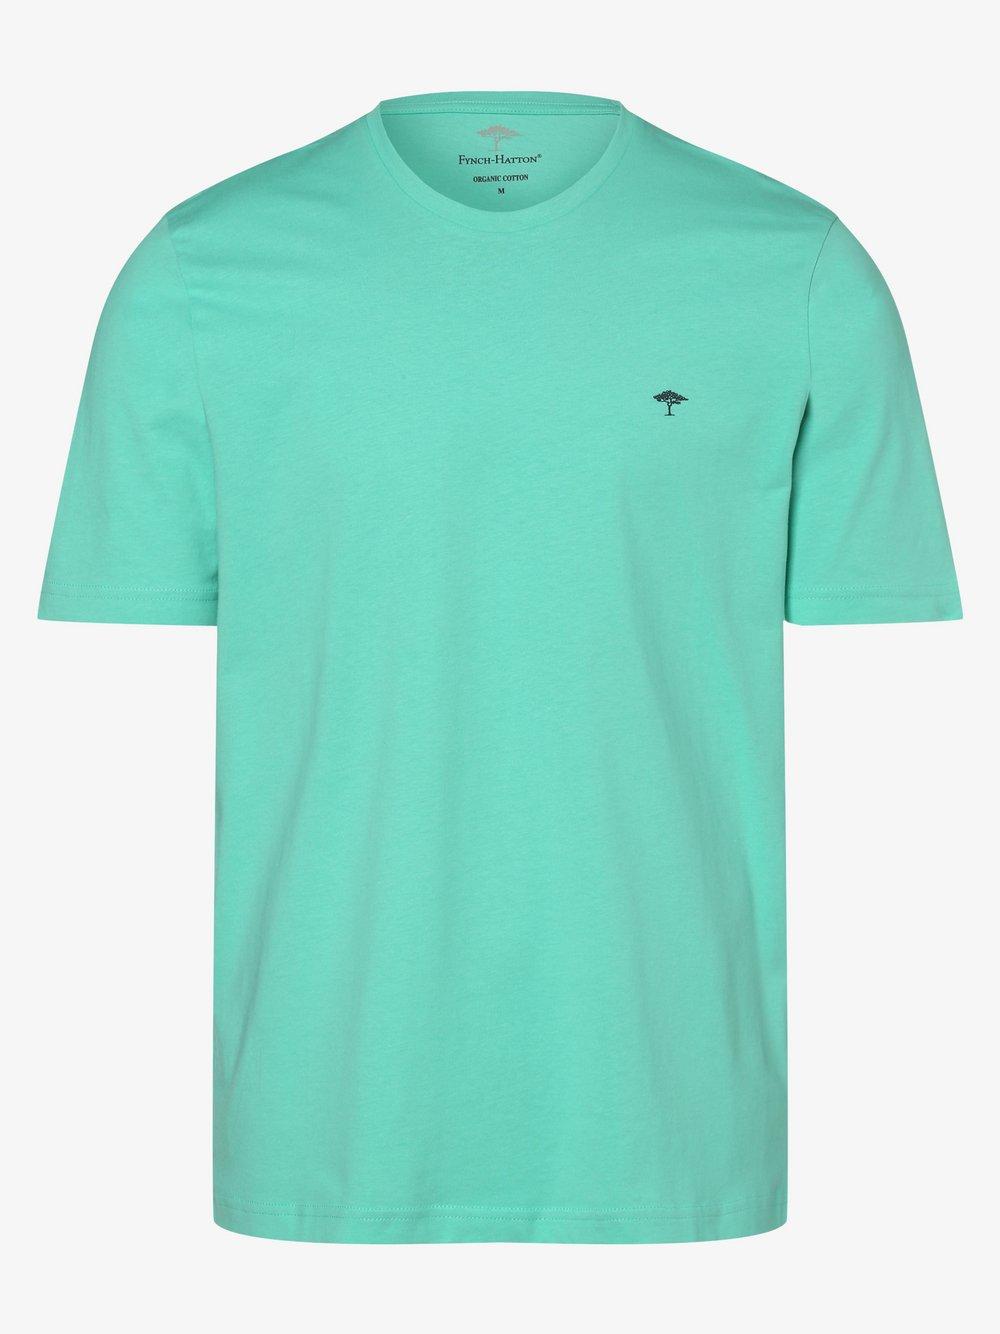 Fynch-Hatton - T-shirt męski, zielony